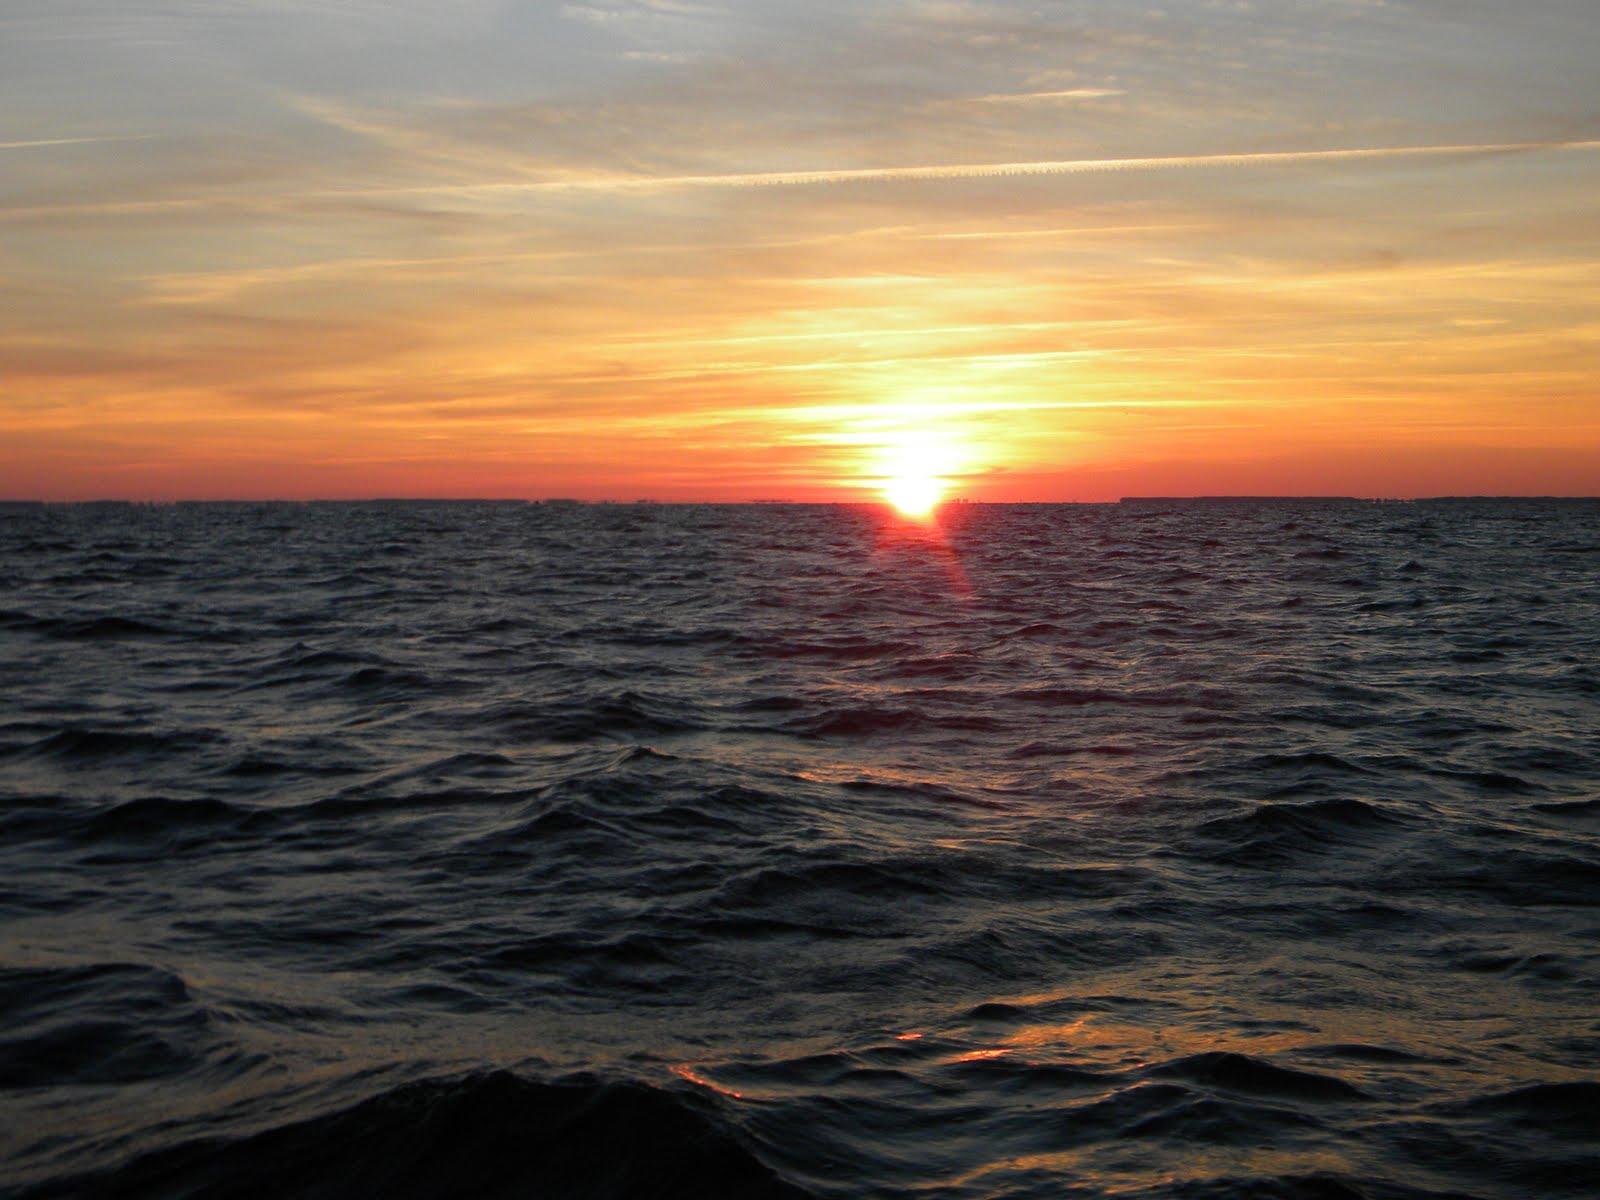 Tourist first maryland chesapeake bay fishing for Chesapeake bay fishing